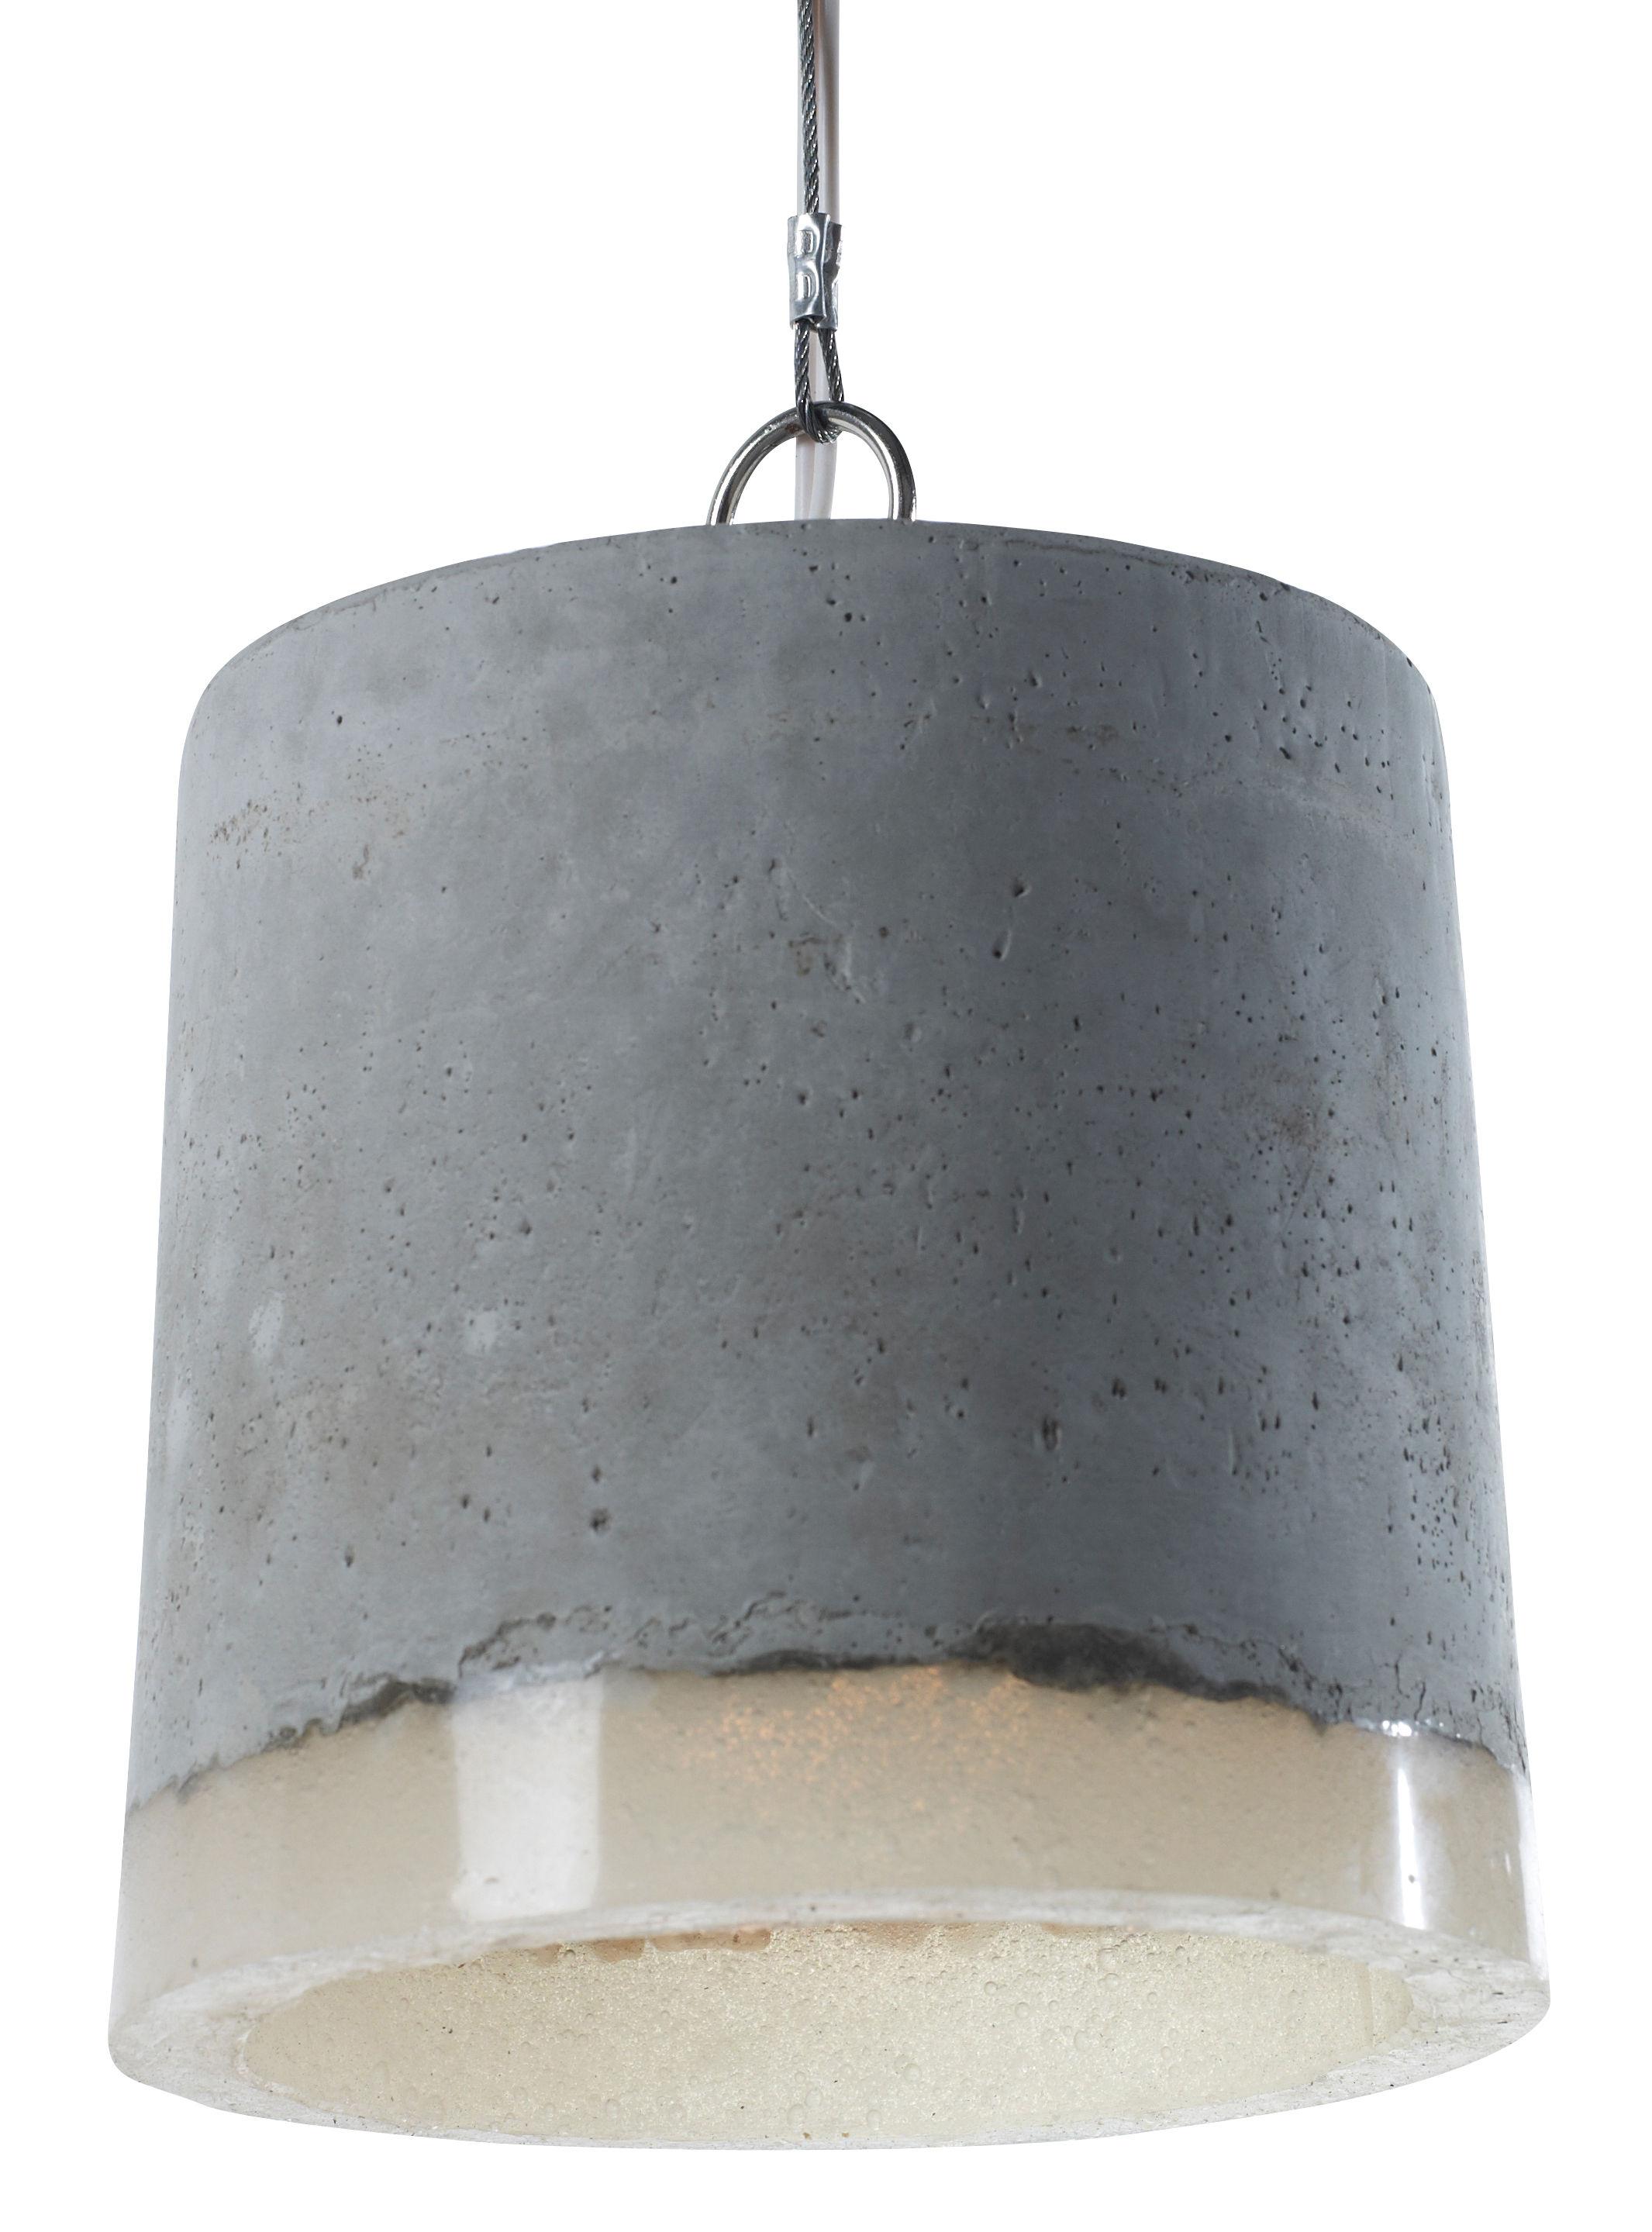 Serax Concrete Ø 18 5 Suspension Cm A53jL4Rq